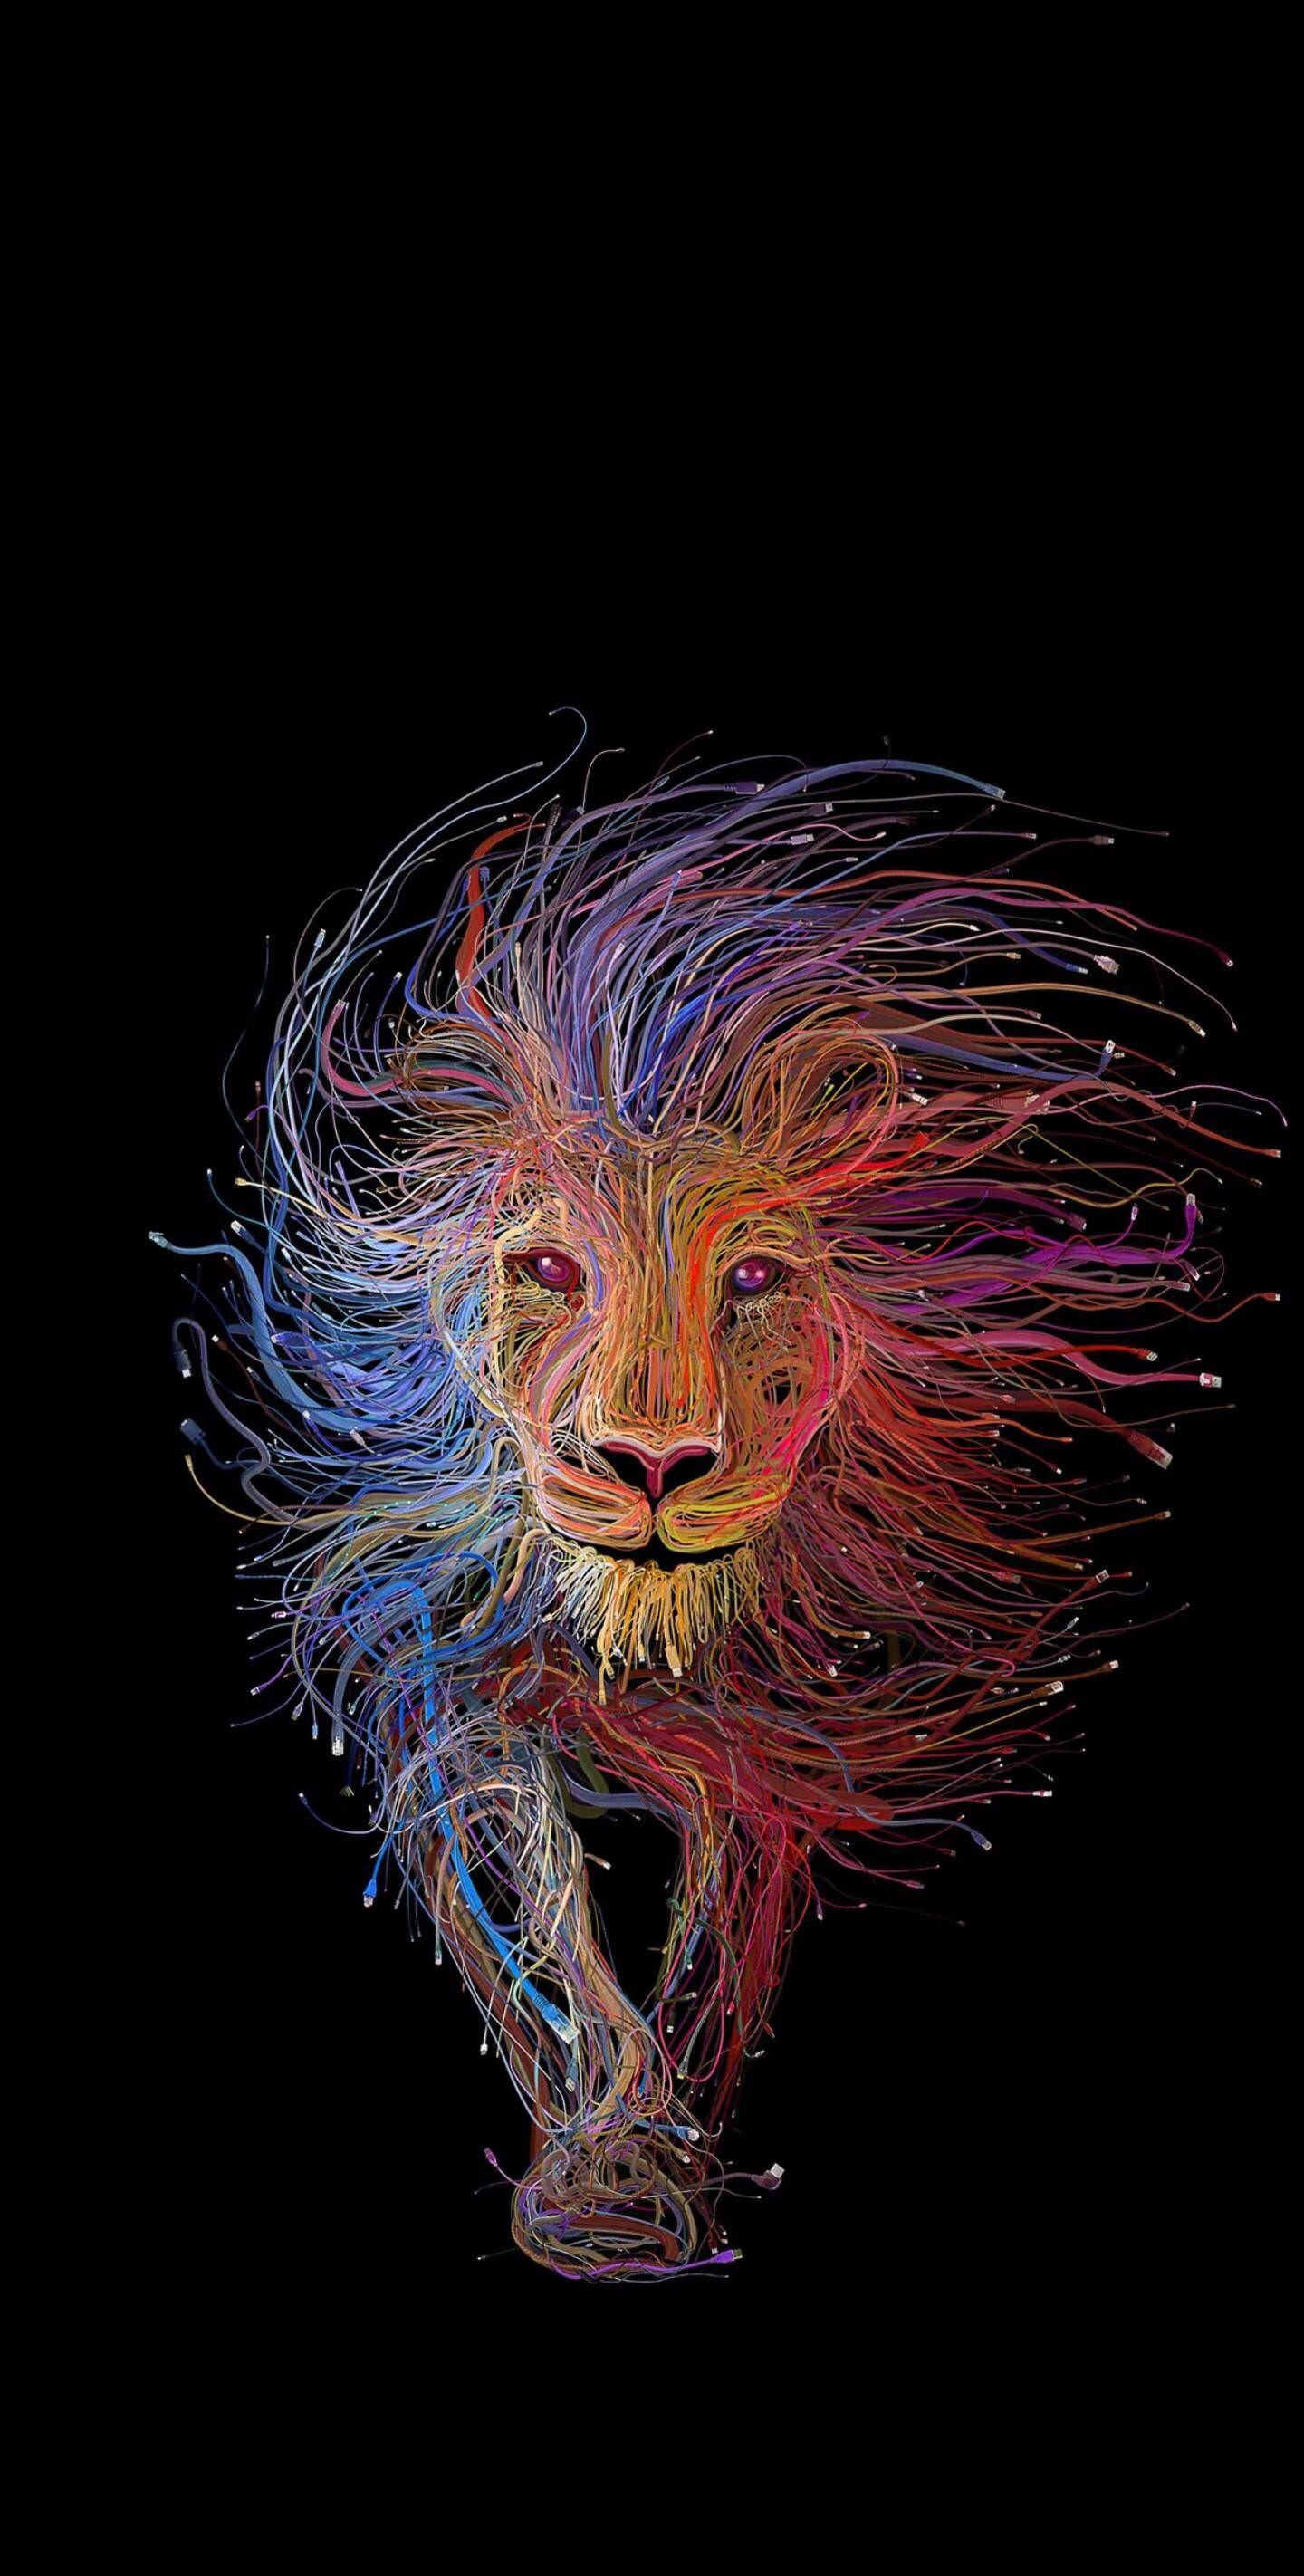 Amoled vivid lion Download at http//www.myfavwallpaper